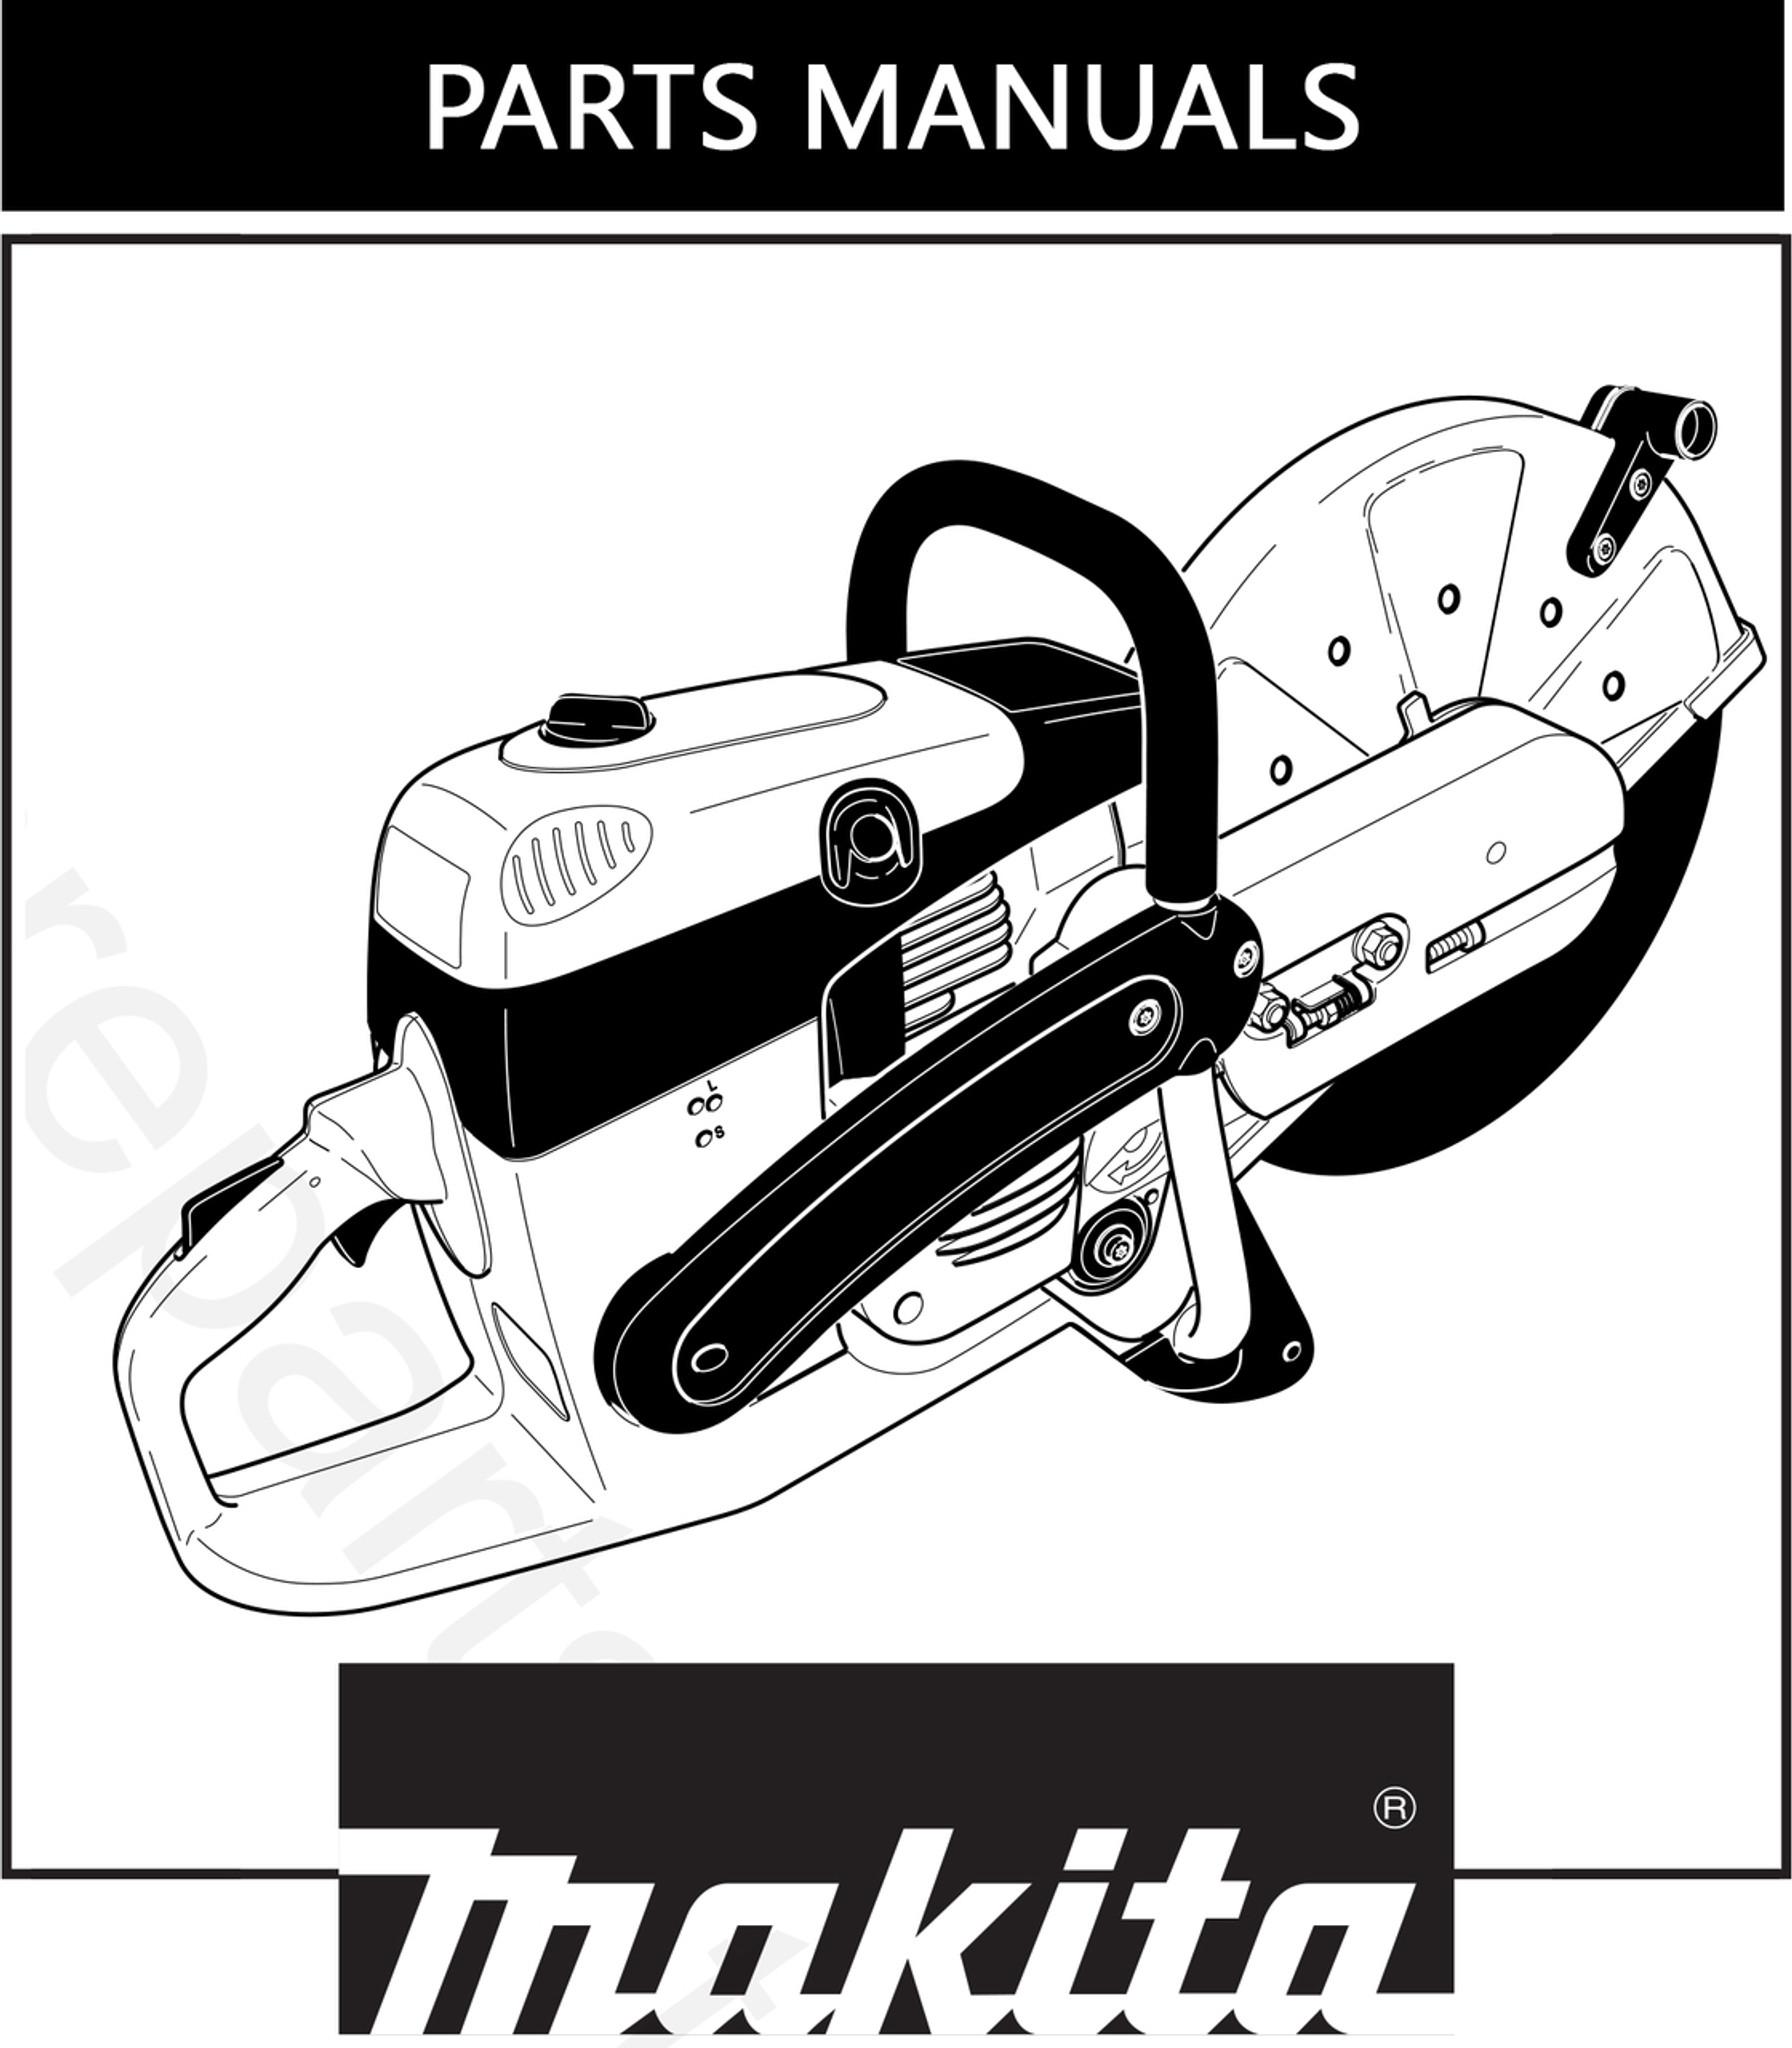 Parts Manual | Makita DPC7321 | Free Download